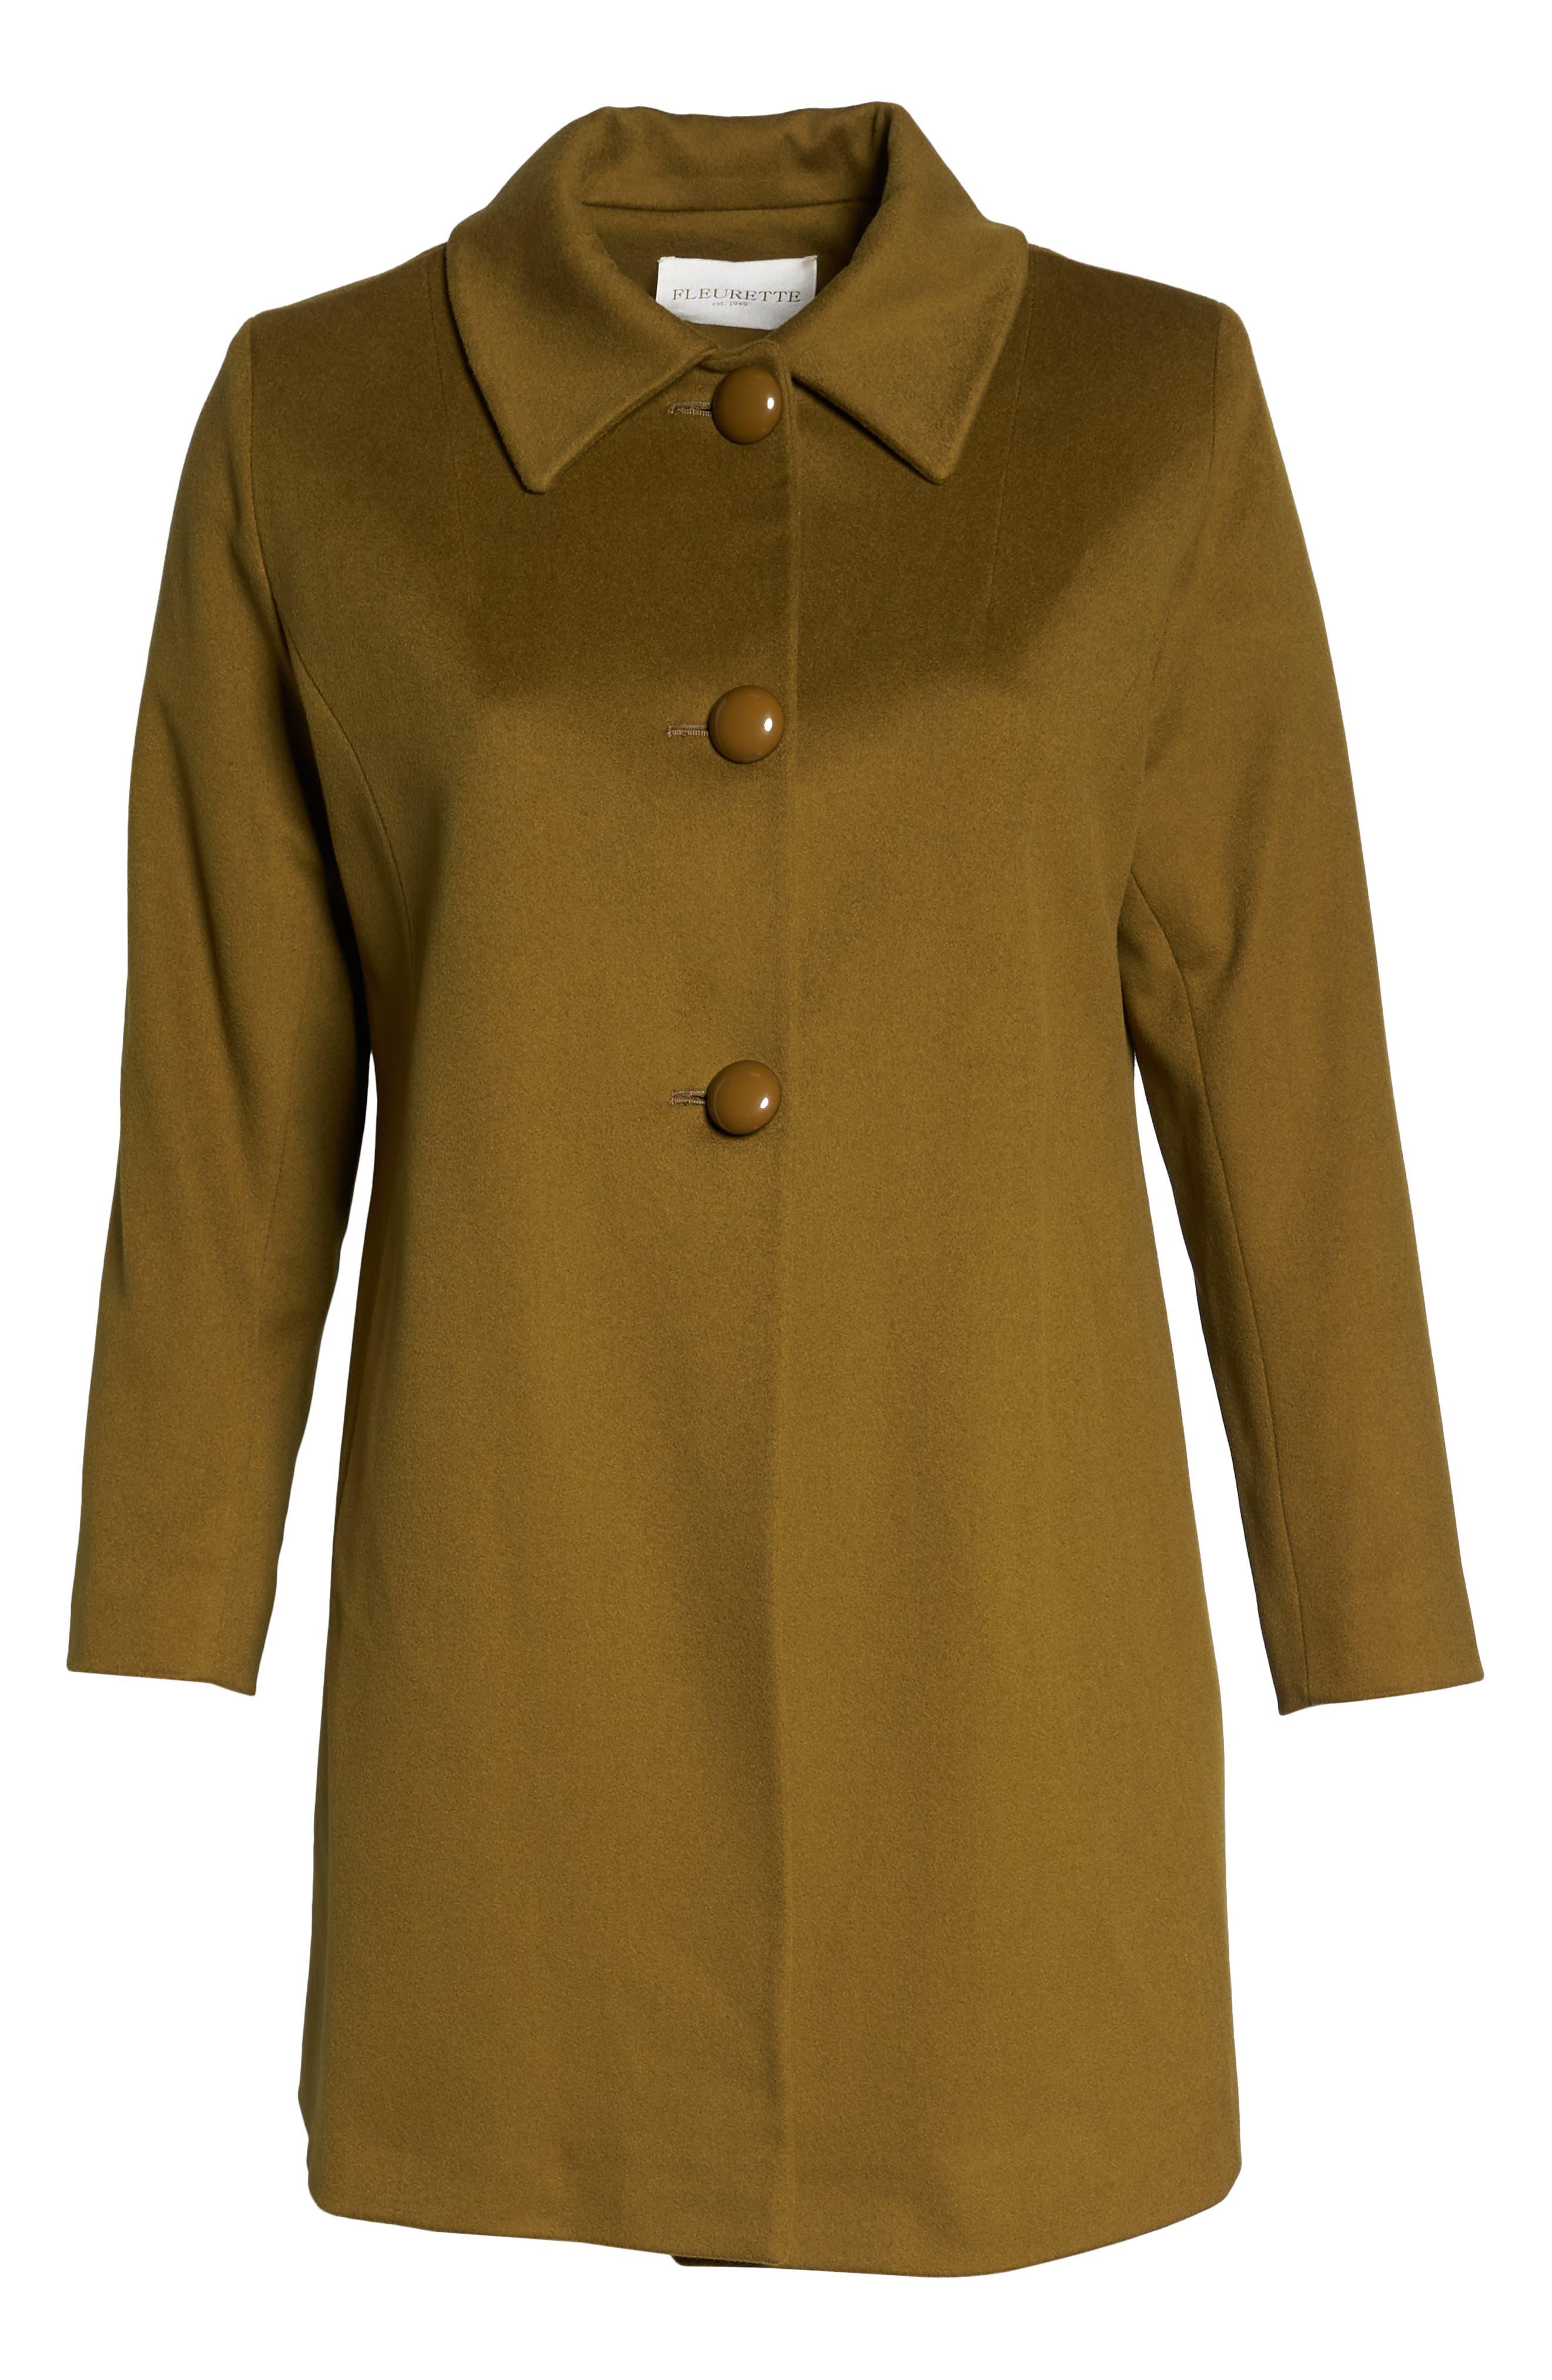 FLEURETTE,                             Loro Piana Wool Car Coat,                             Alternate thumbnail 6, color,                             305